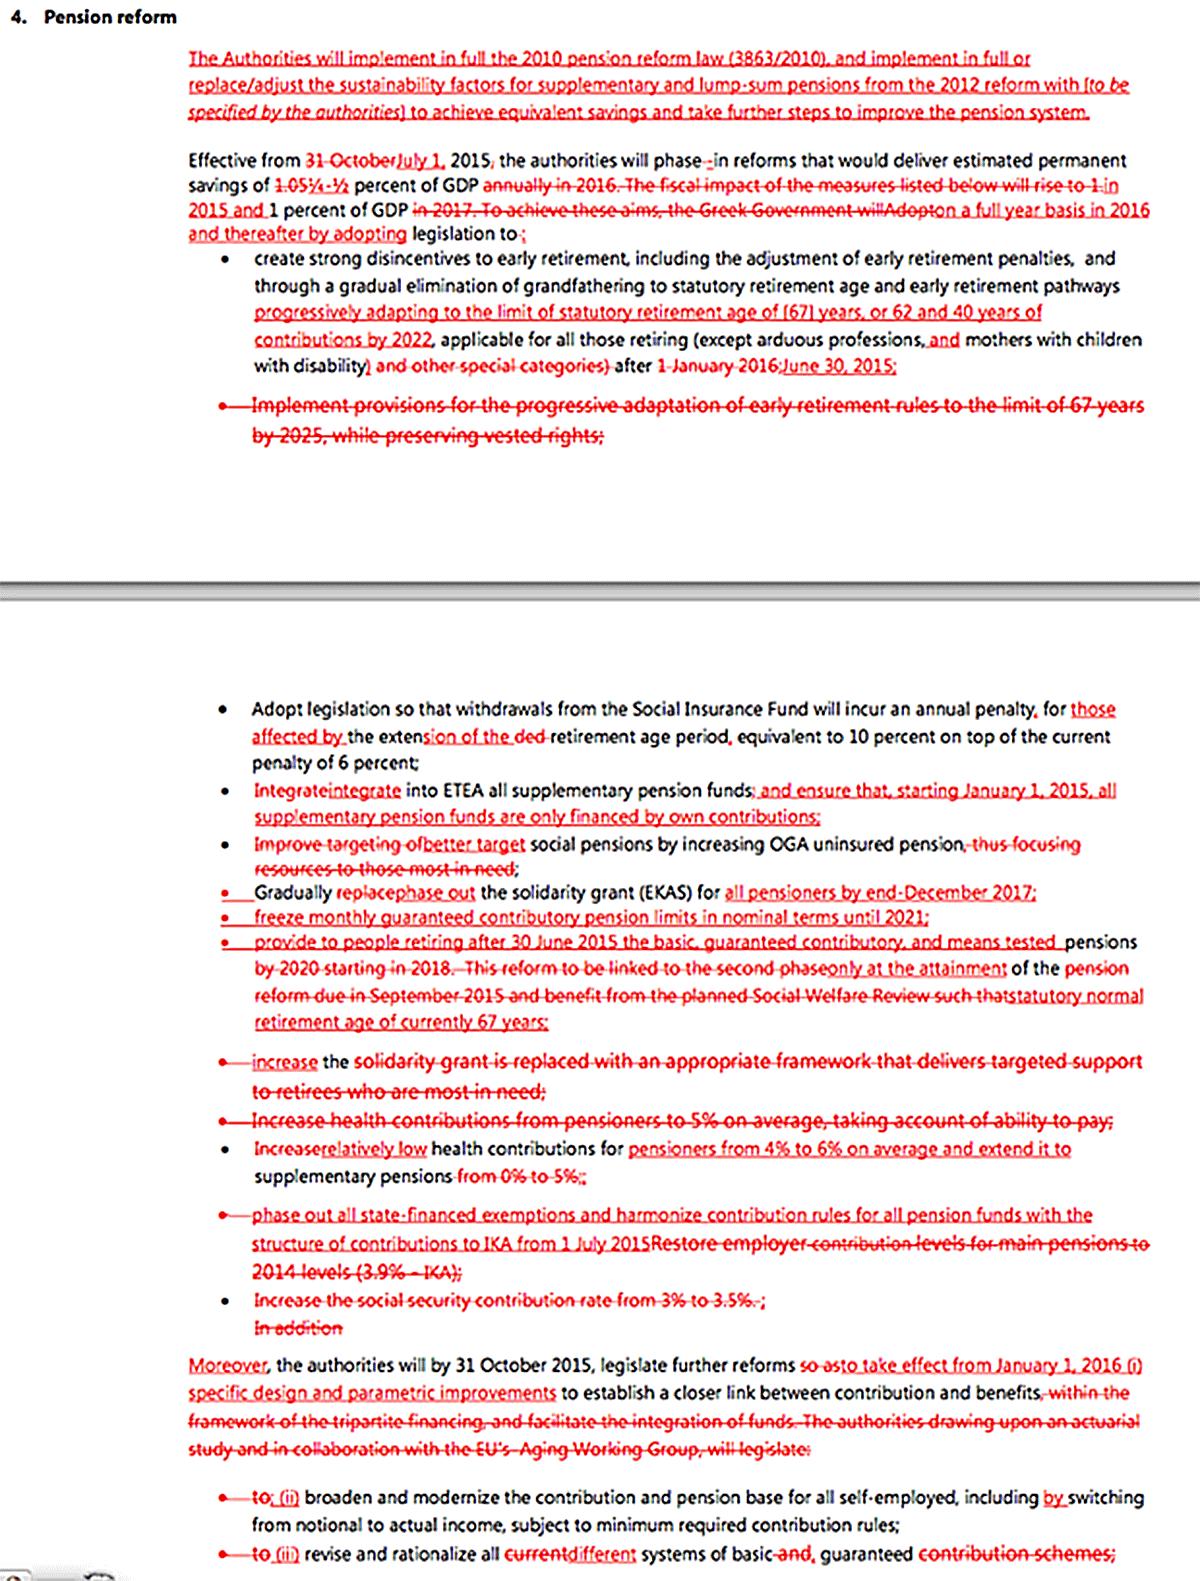 imf-counter-proposal-2